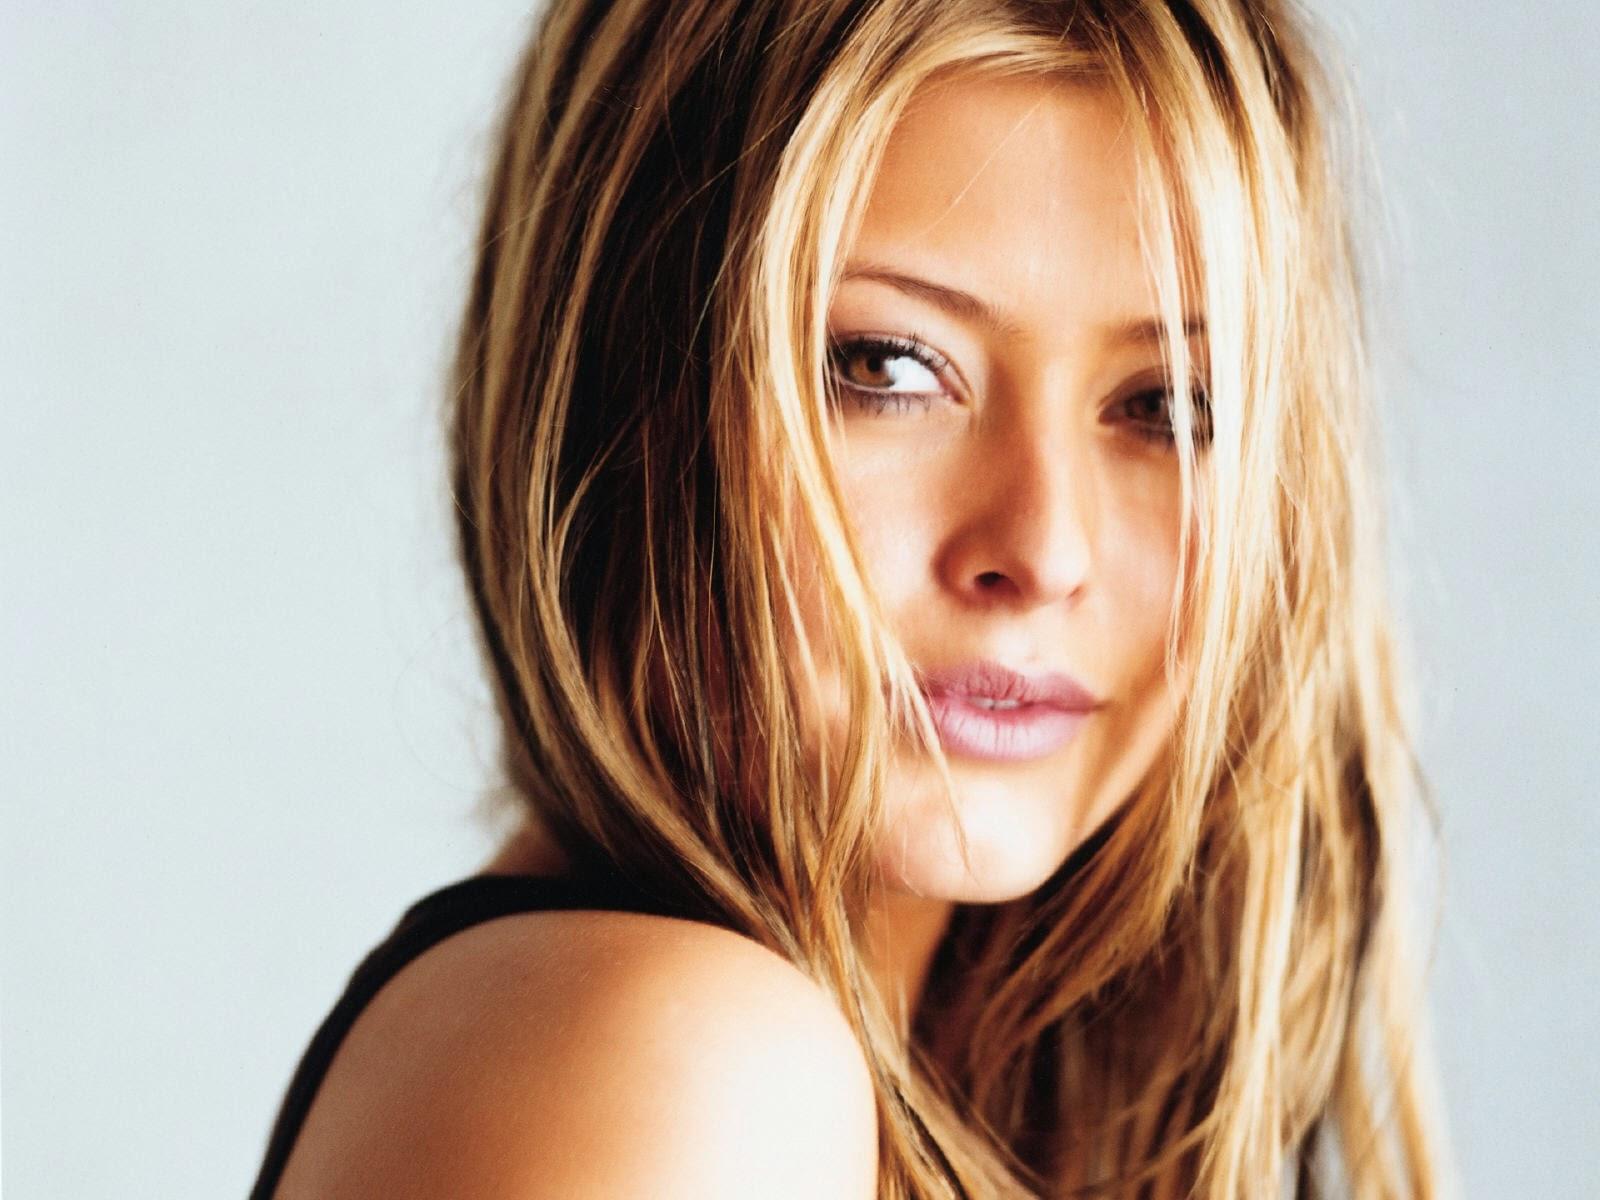 Celebrities in Hot Bikini: Holly Valance - Singer, Actress ...